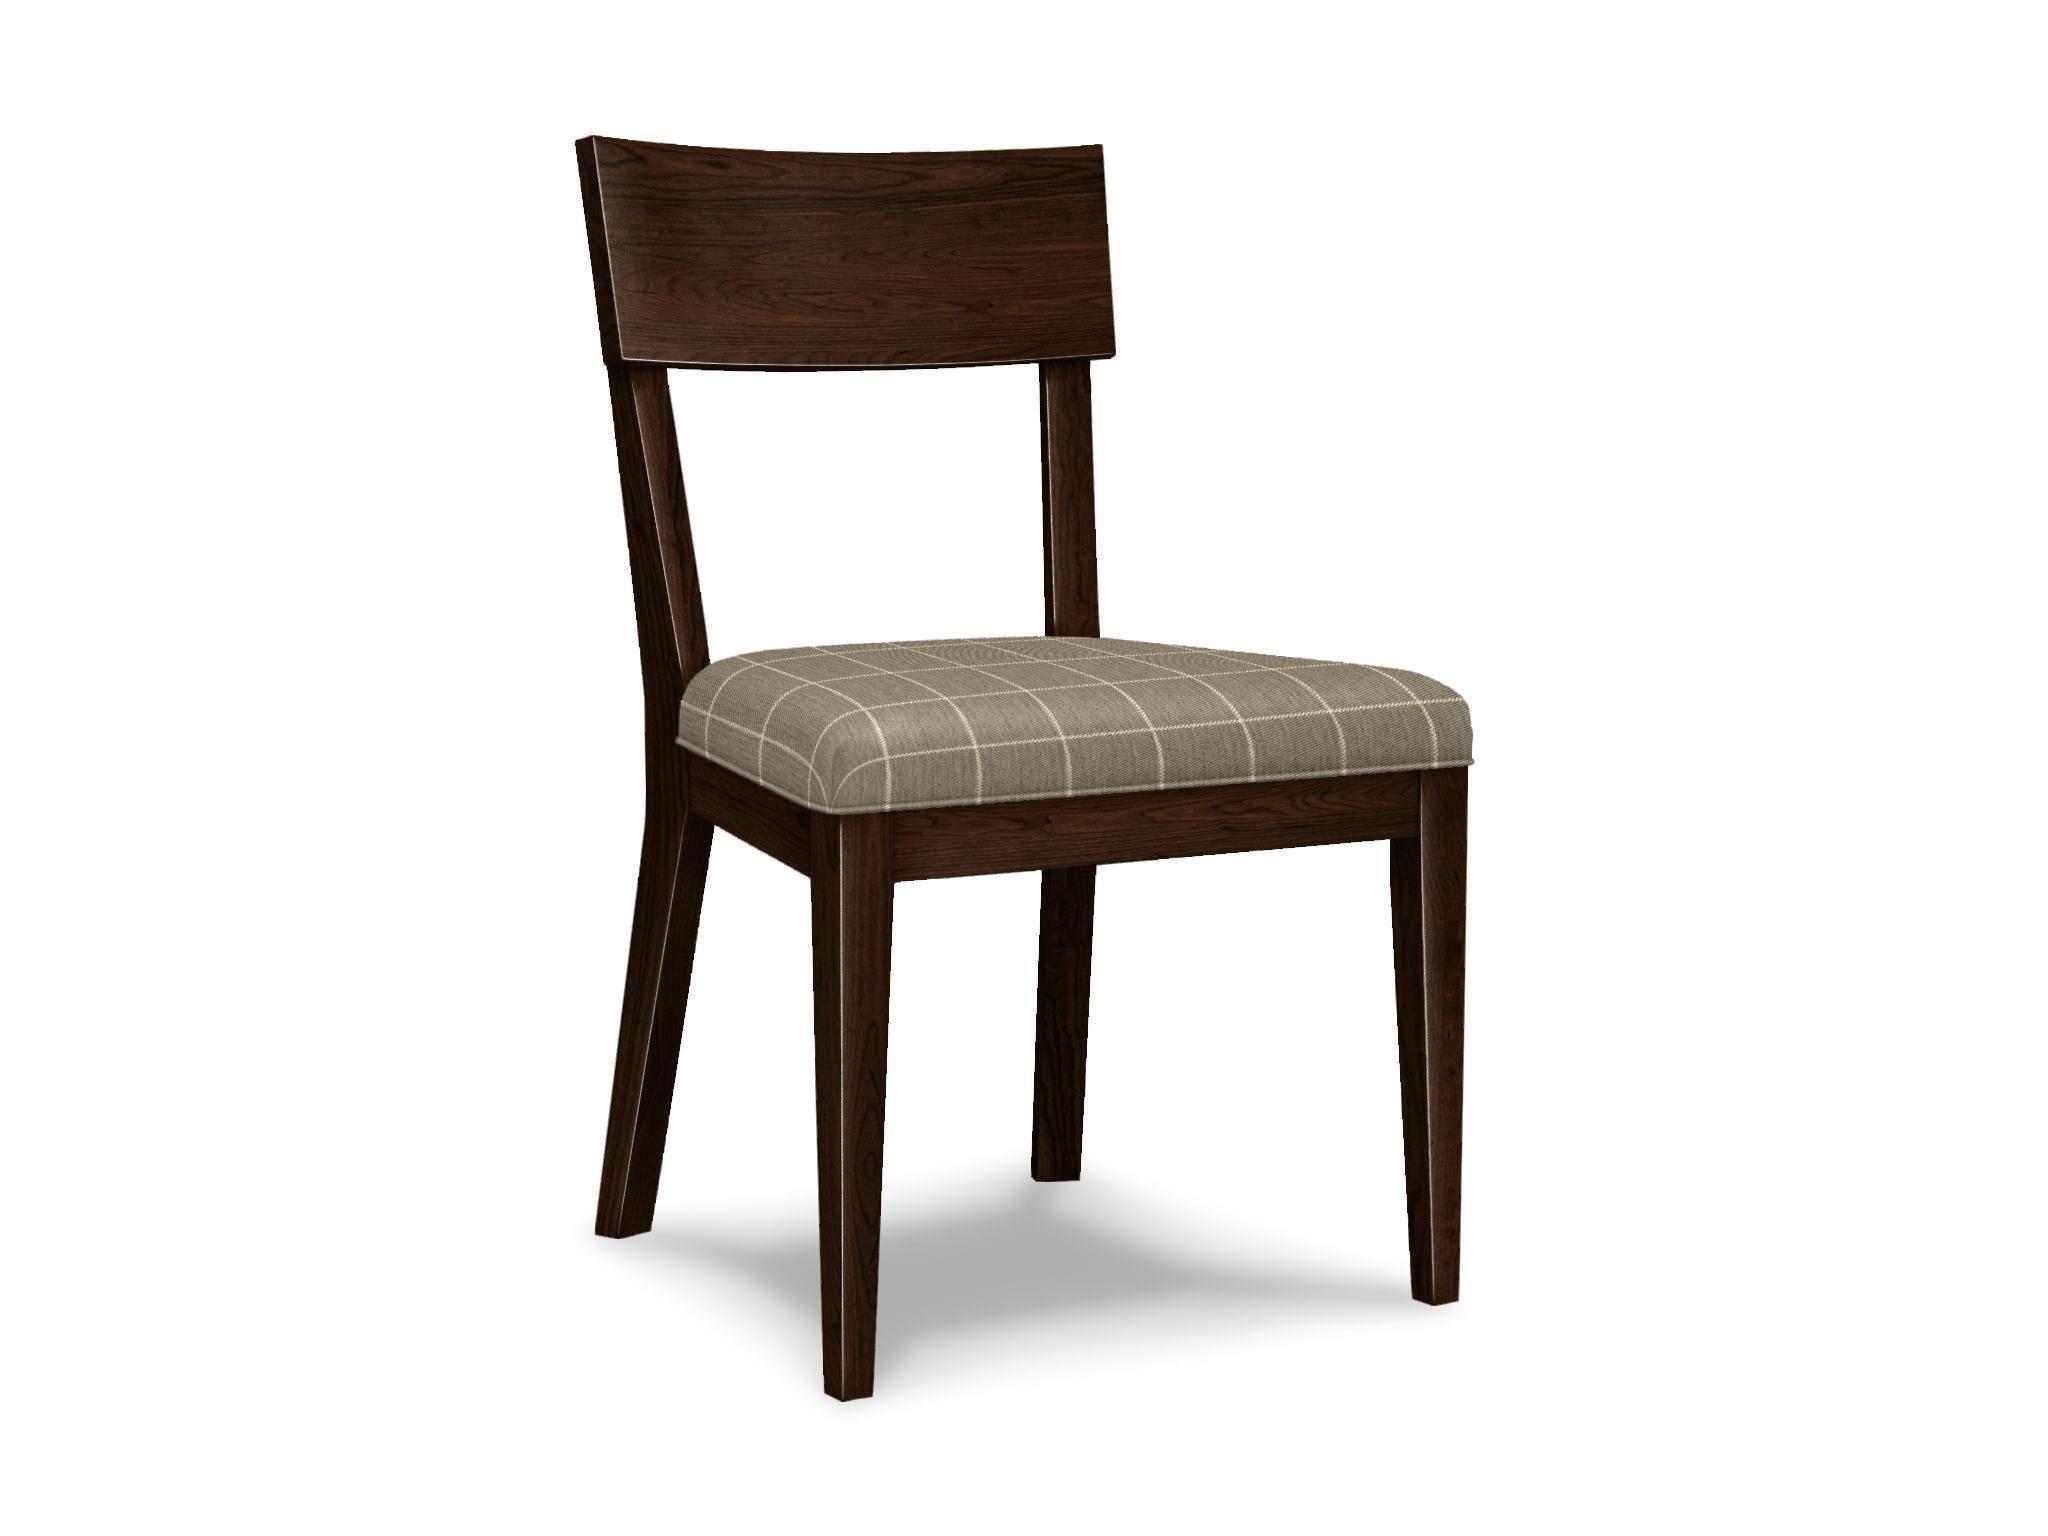 Finley Side Chair 246301 Ethan Allen Danbury Ct Oggetti